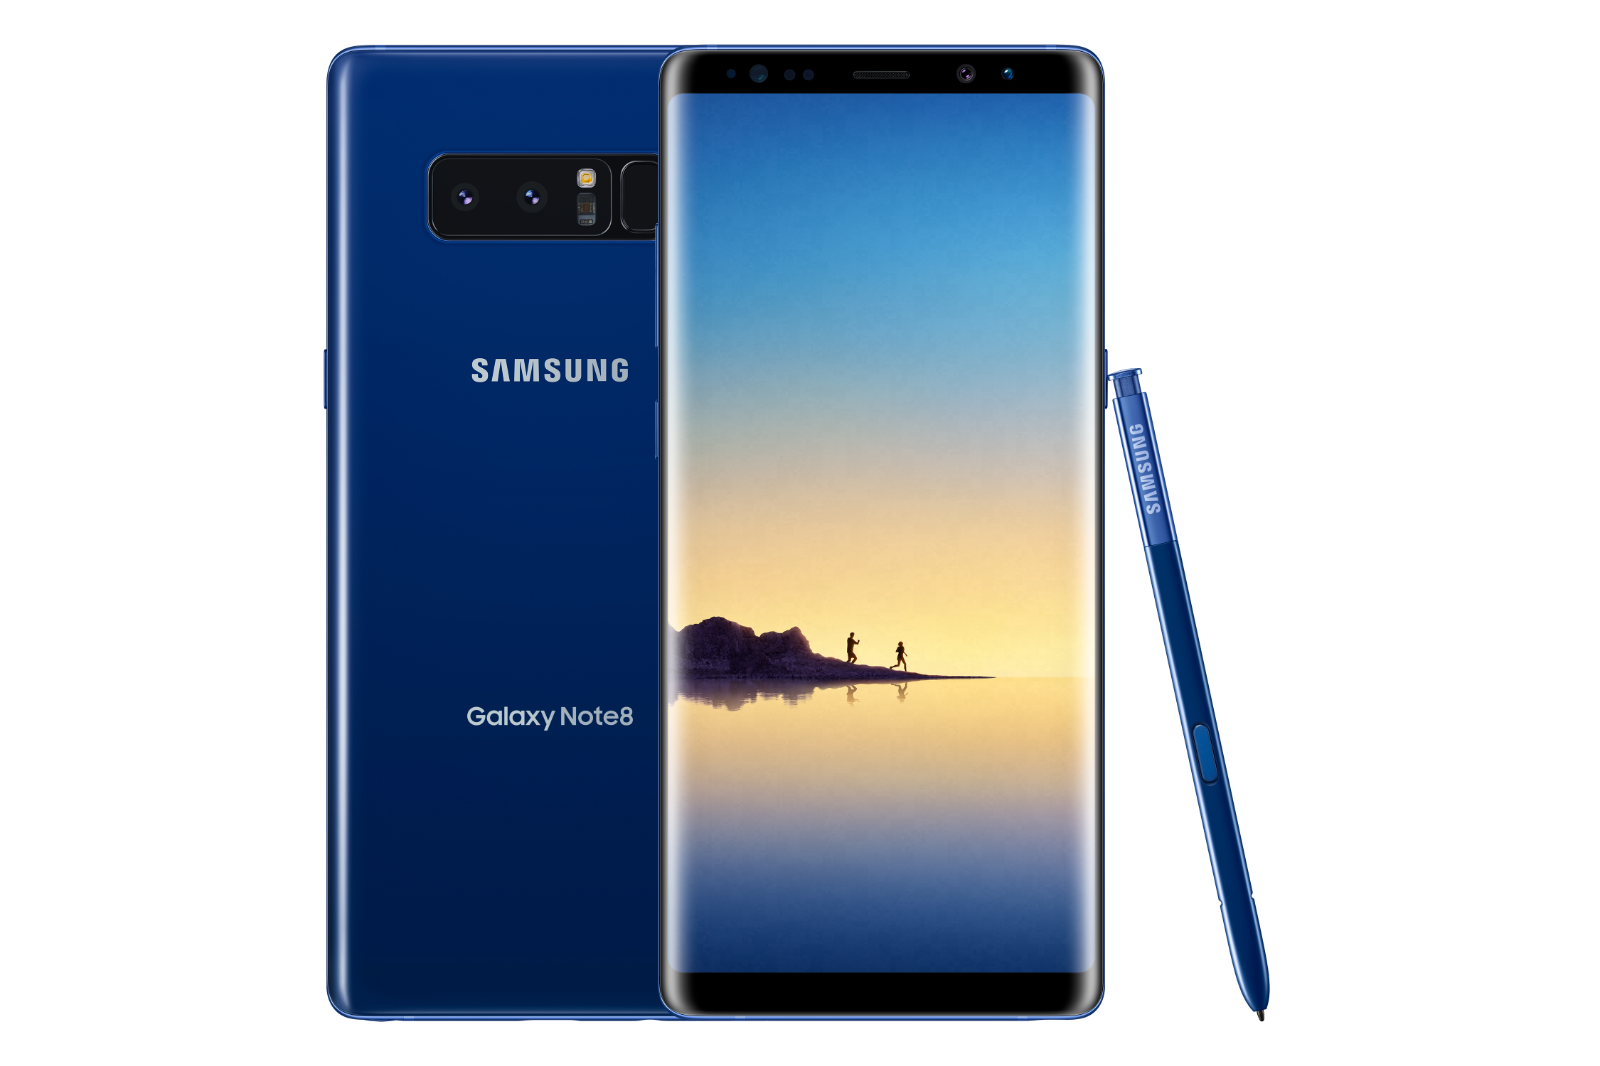 Samsung Galaxy Note 8 N950U 64GB Blue Unlocked Smartphone AT&T T-Mobile Verizon